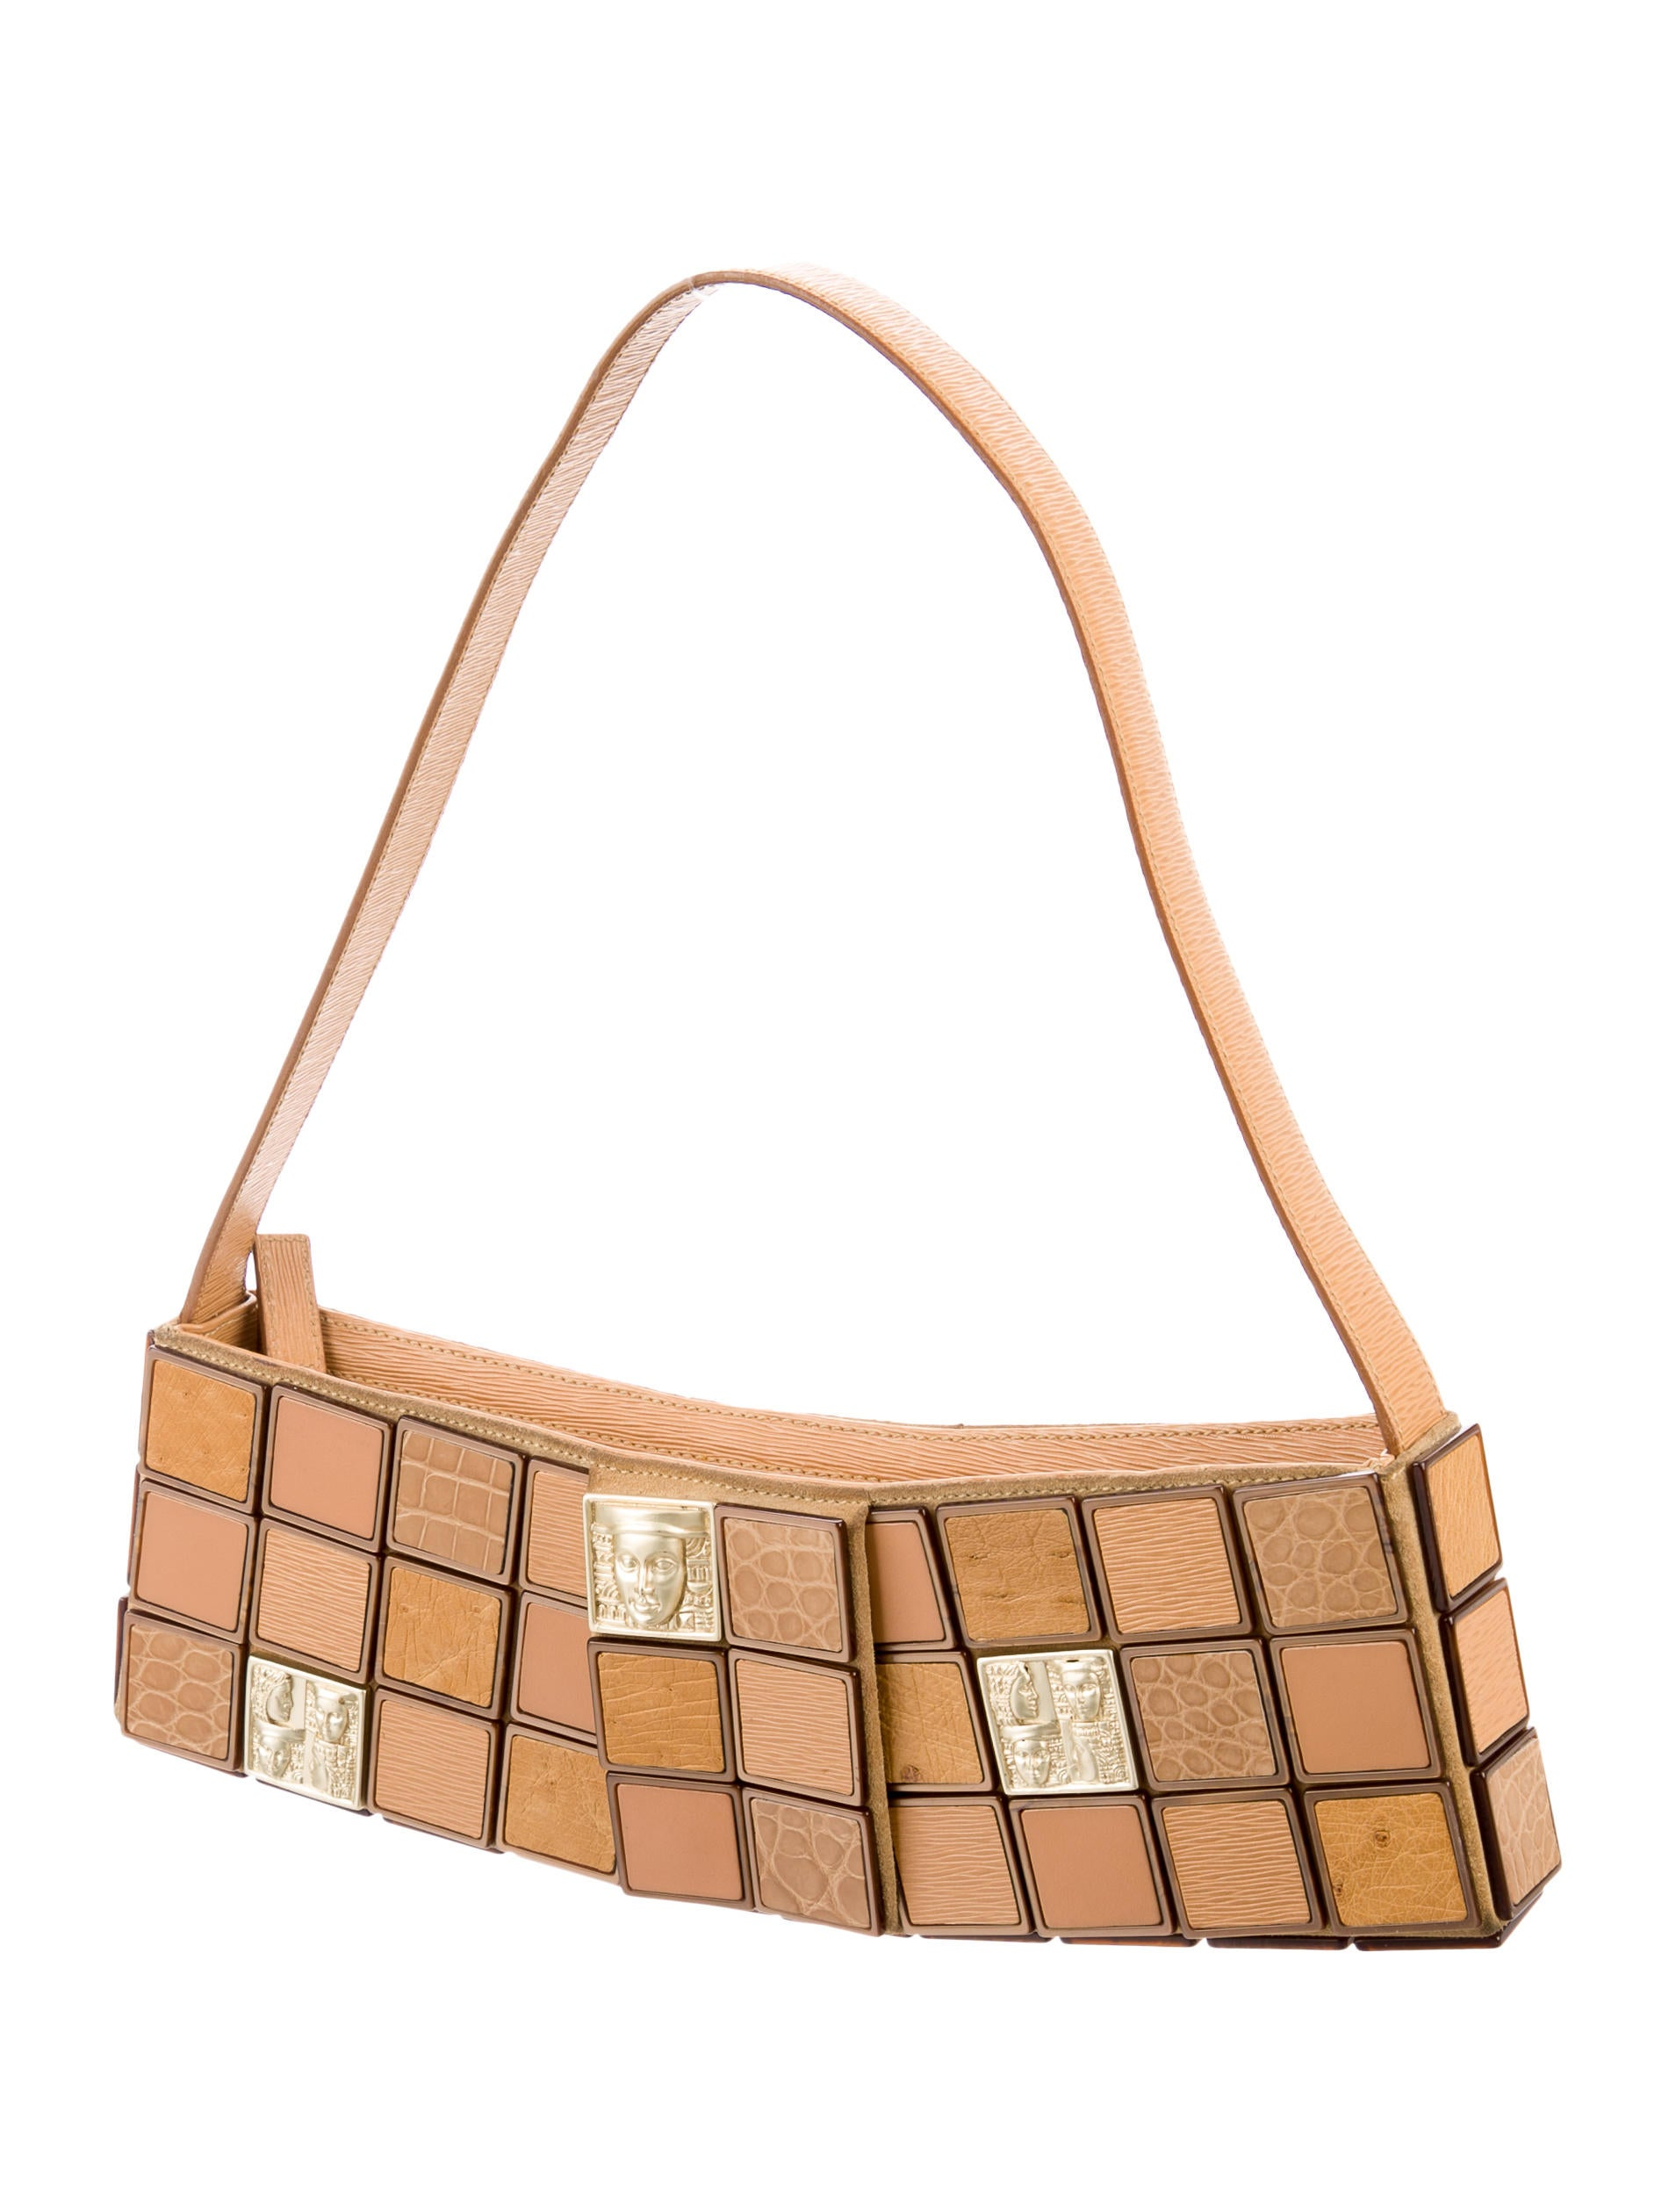 Barry Kieselstein Cord Women Of The World Tiles Bag Handbags Bkc21338 The Realreal